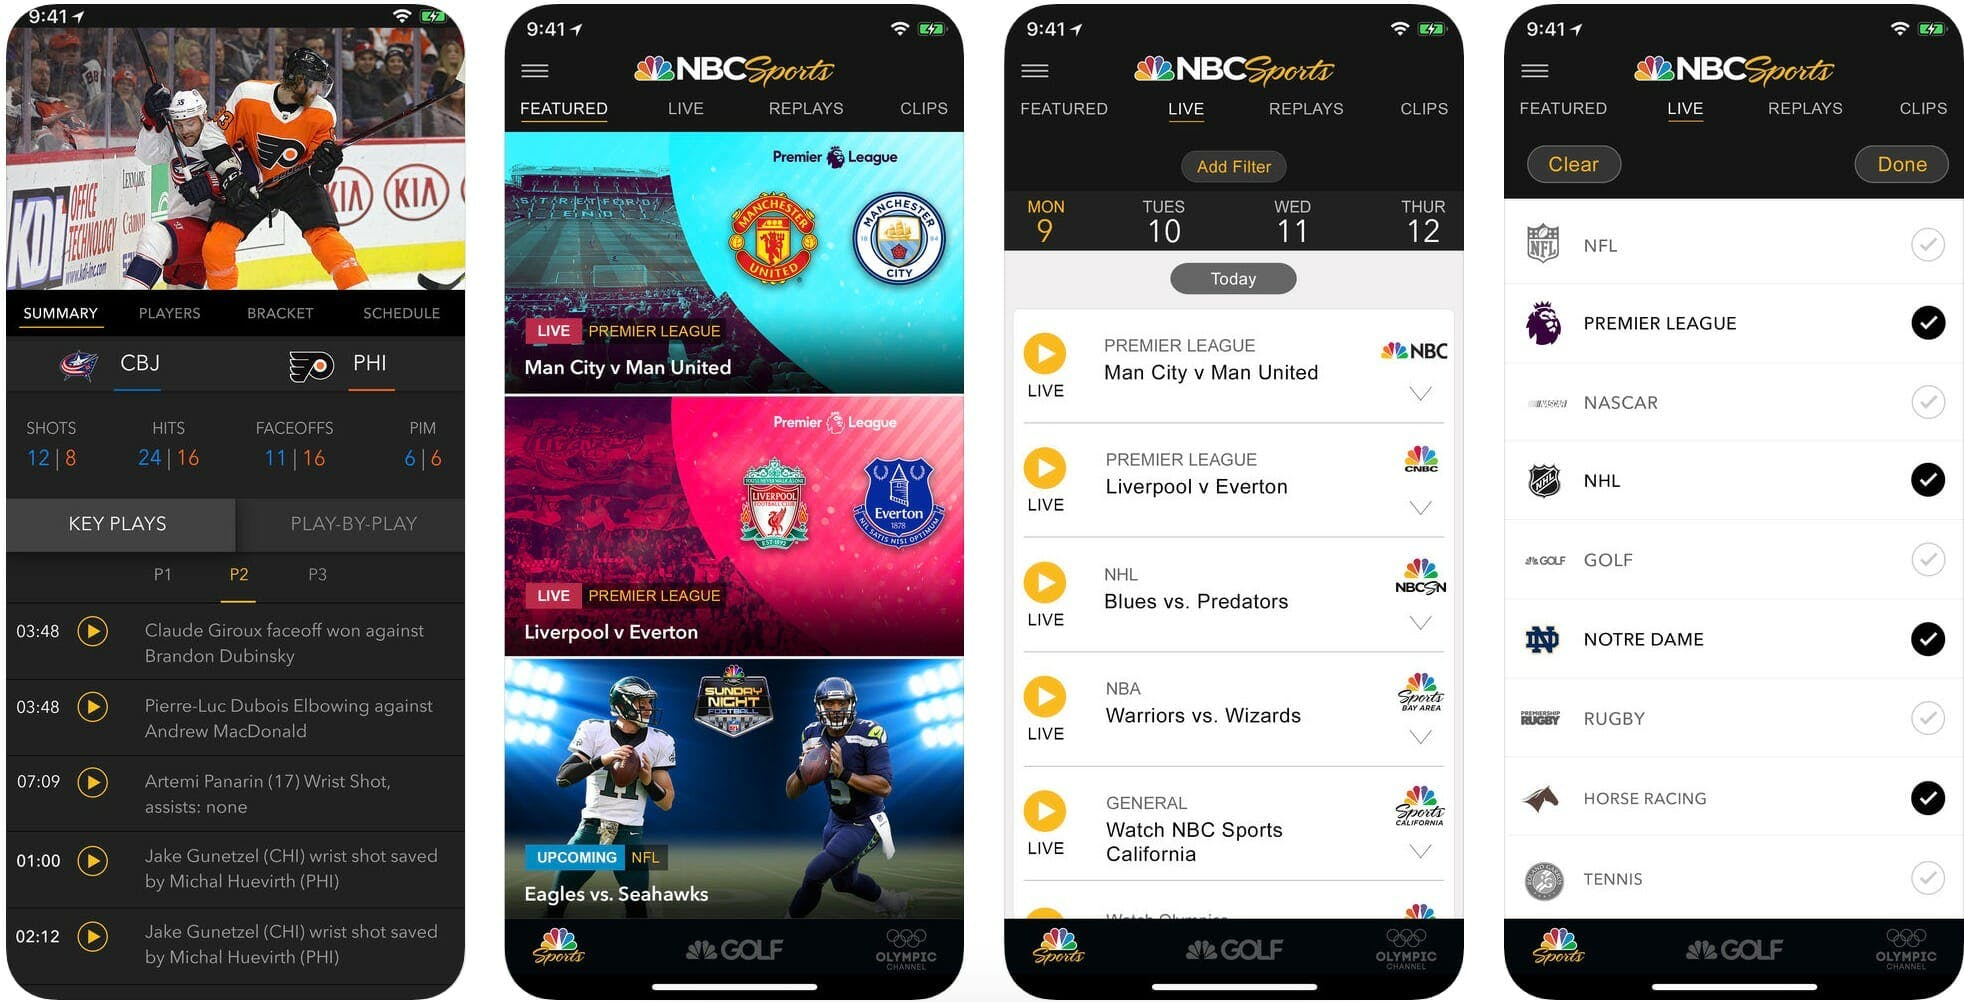 nbc sports live stream